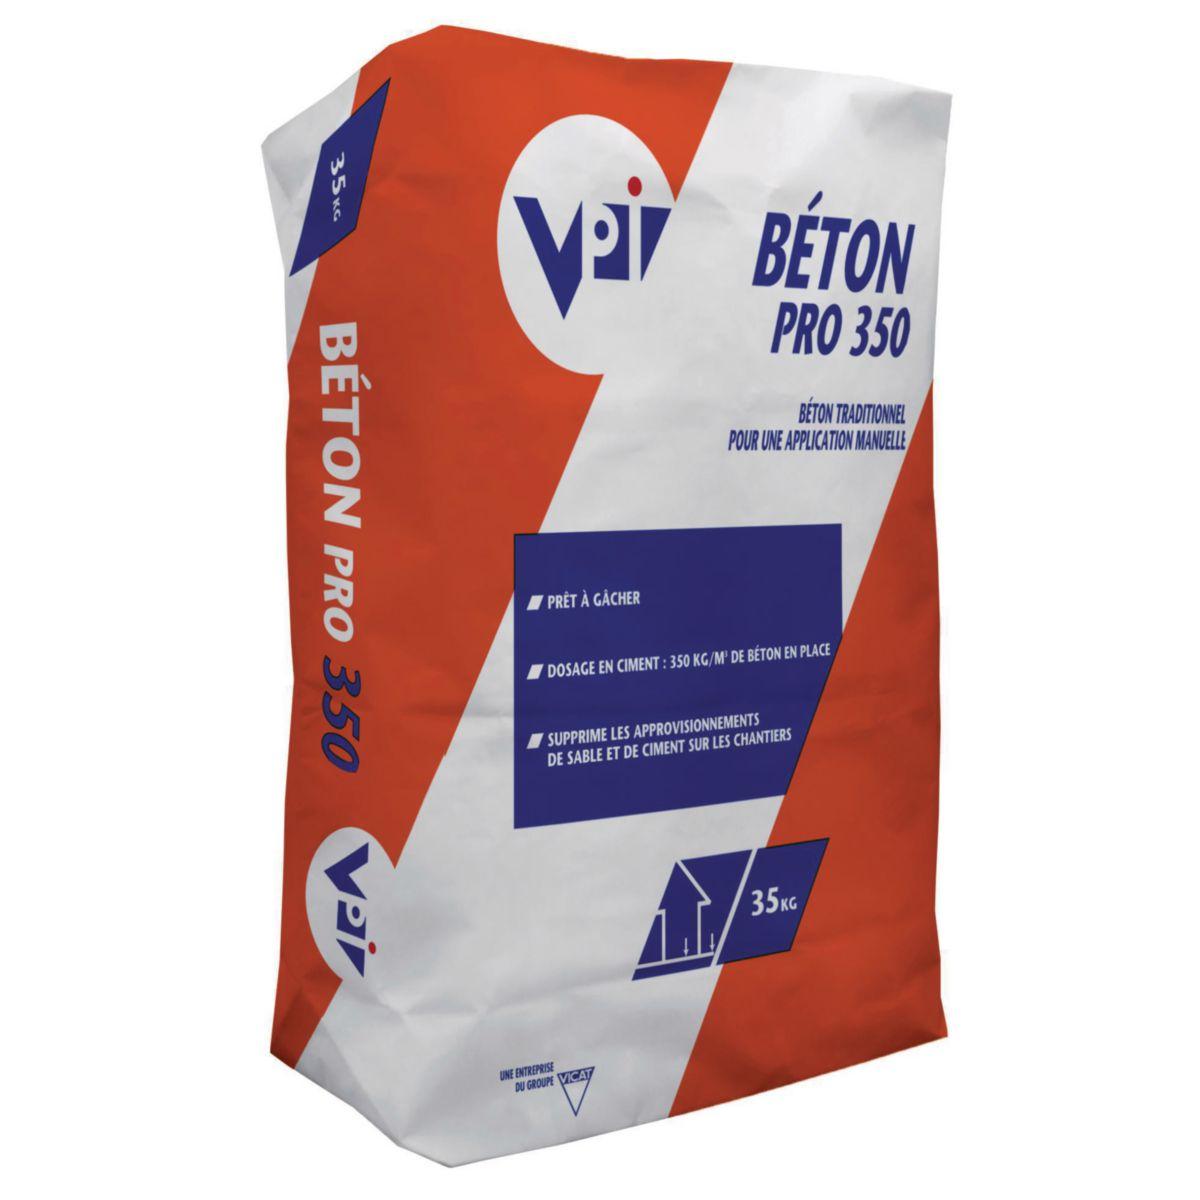 Bton drainant en sac awesome excellent mortier allg polys - Beton pret al emploi en sac ...